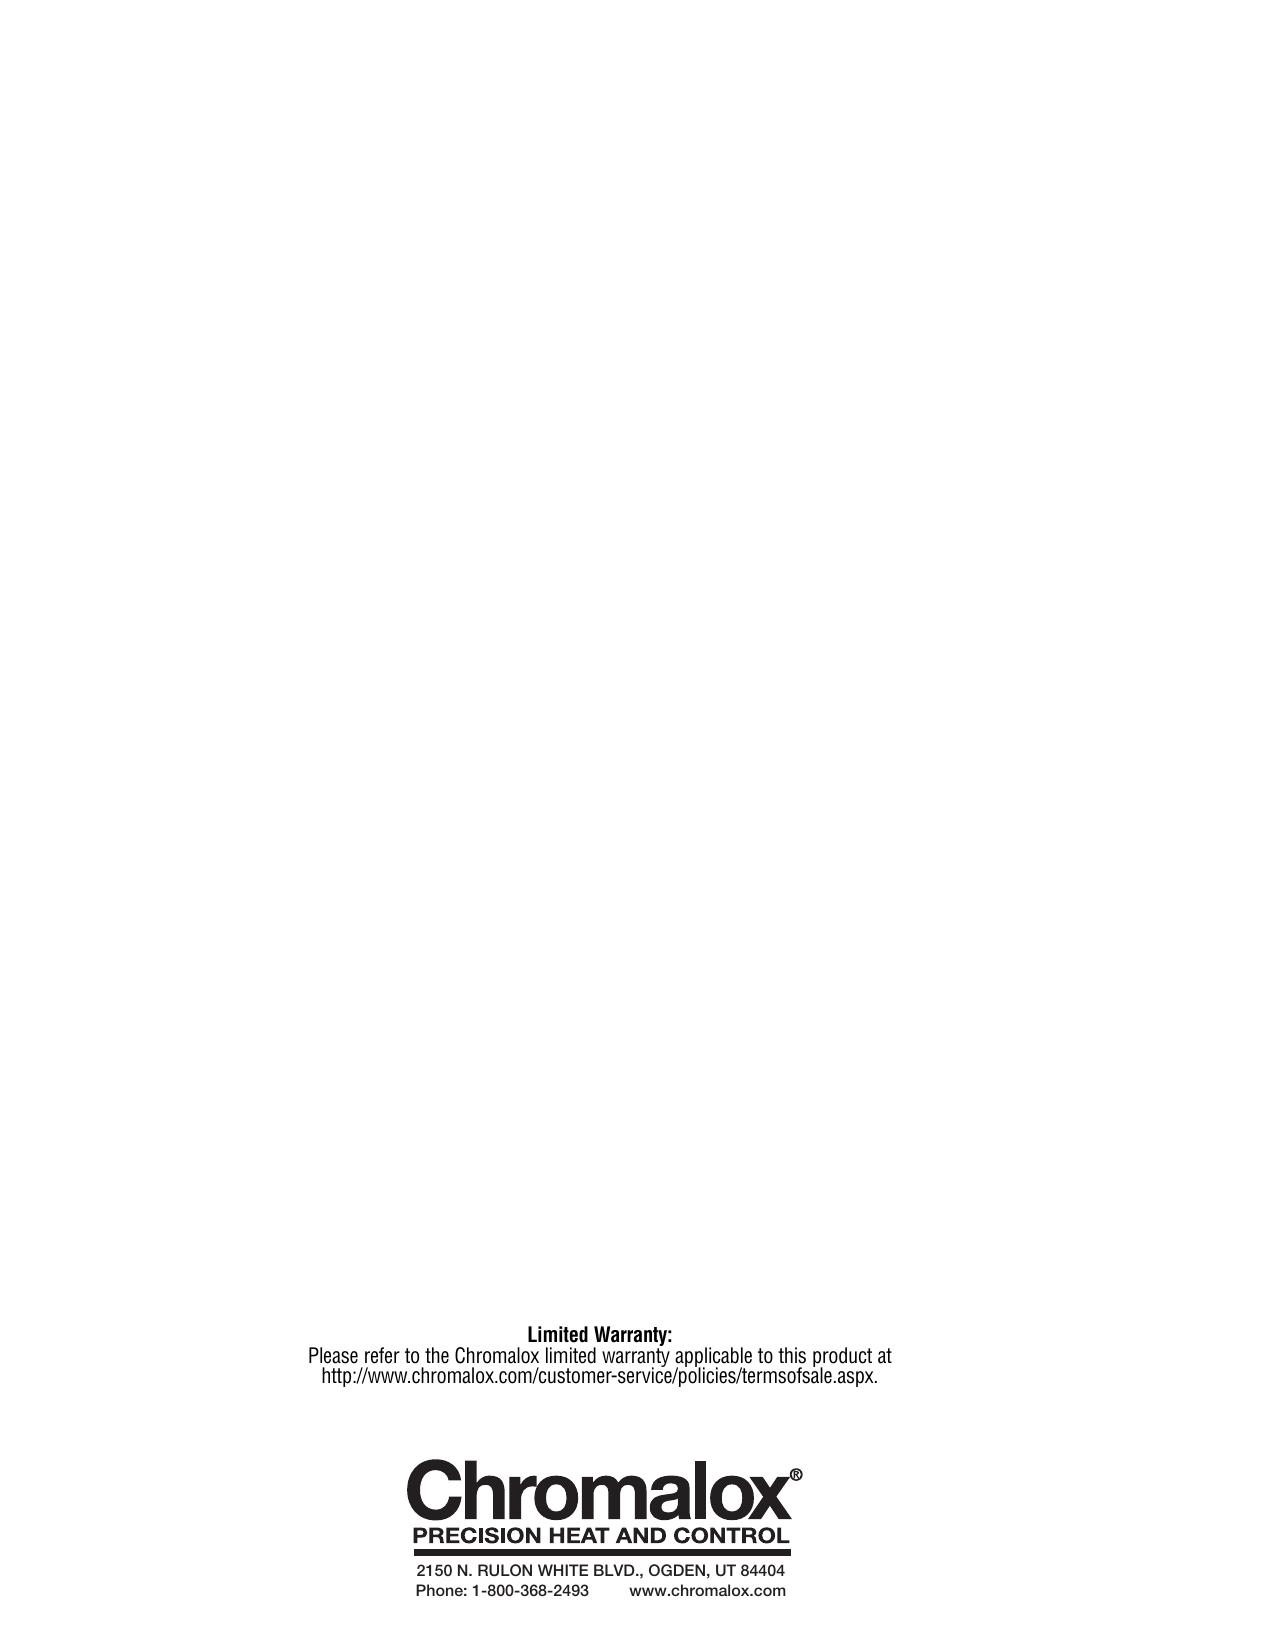 Chromalox Ub 3502A Users Manual PF424 4 CHX on heater pump diagram, heater radiator, thermo king reefer unit diagram, voltage regulator diagram, heater control diagram, heater coil diagram, heater thermostat diagram, water heater installation diagram, heater hoses diagram, wiper motor diagram, home heating diagram, solar panel inverter circuit diagram, heater circuit diagram, thermo king tripac apu diagram, doorbell installation diagram, transmission diagram, reddy heater parts diagram, tankless water heater diagram, doorbell wire connection diagram, plc input and output diagram,